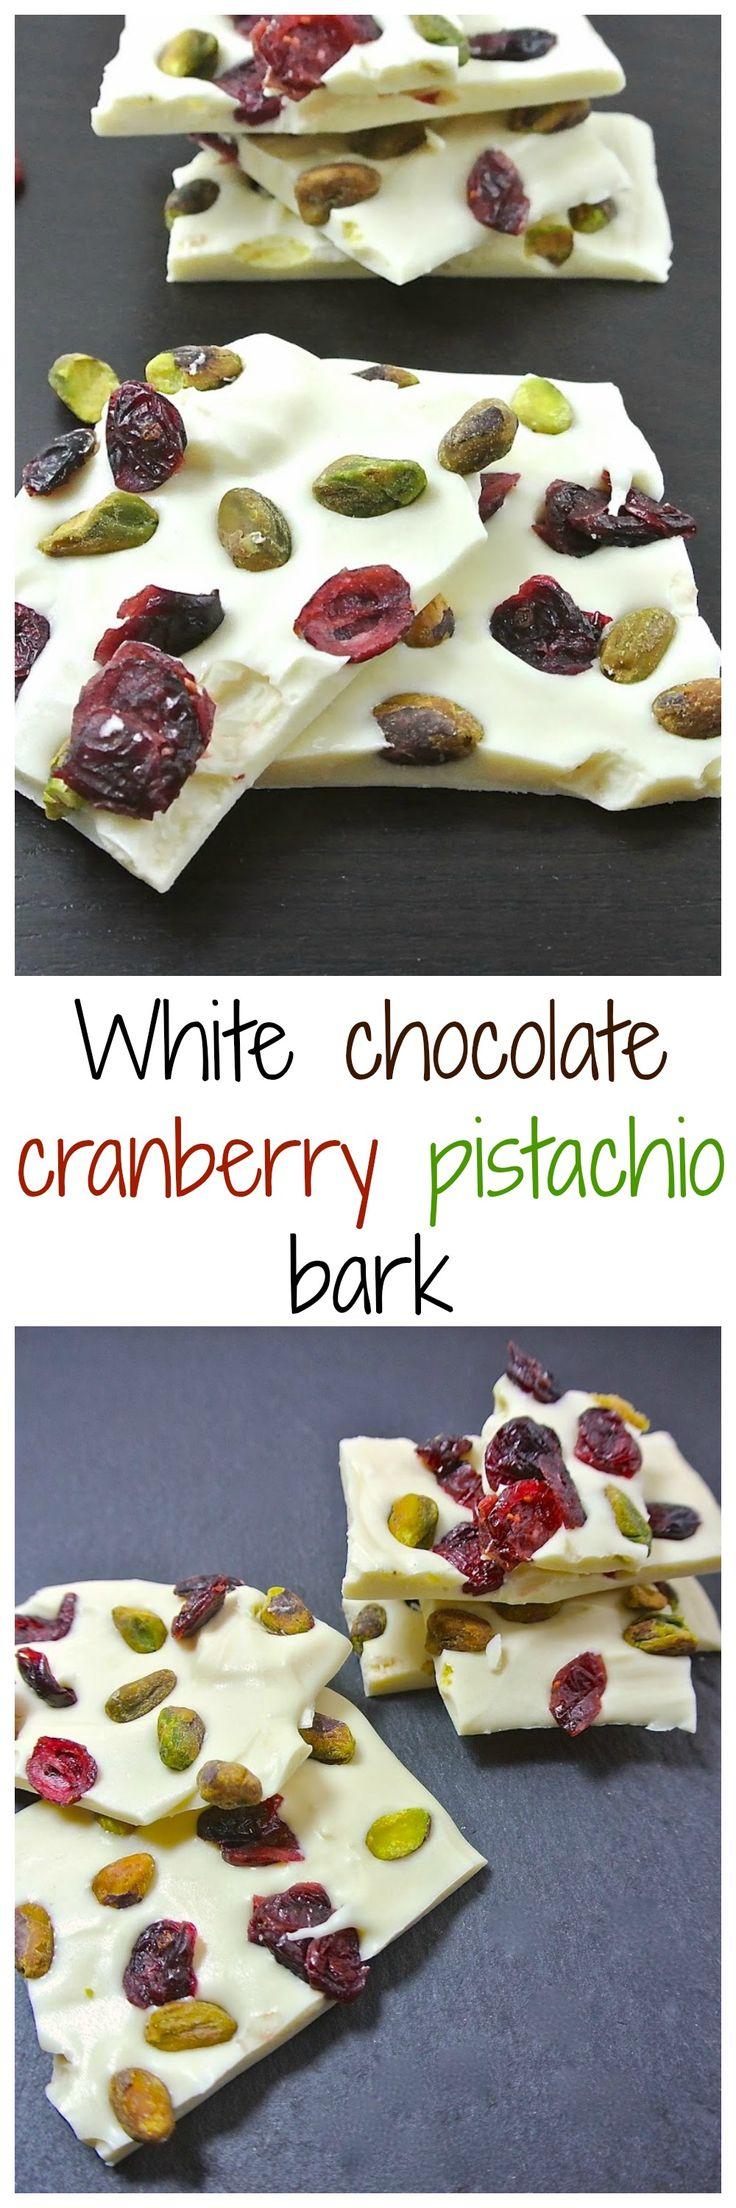 White chocolate cranberry & pistachio bark